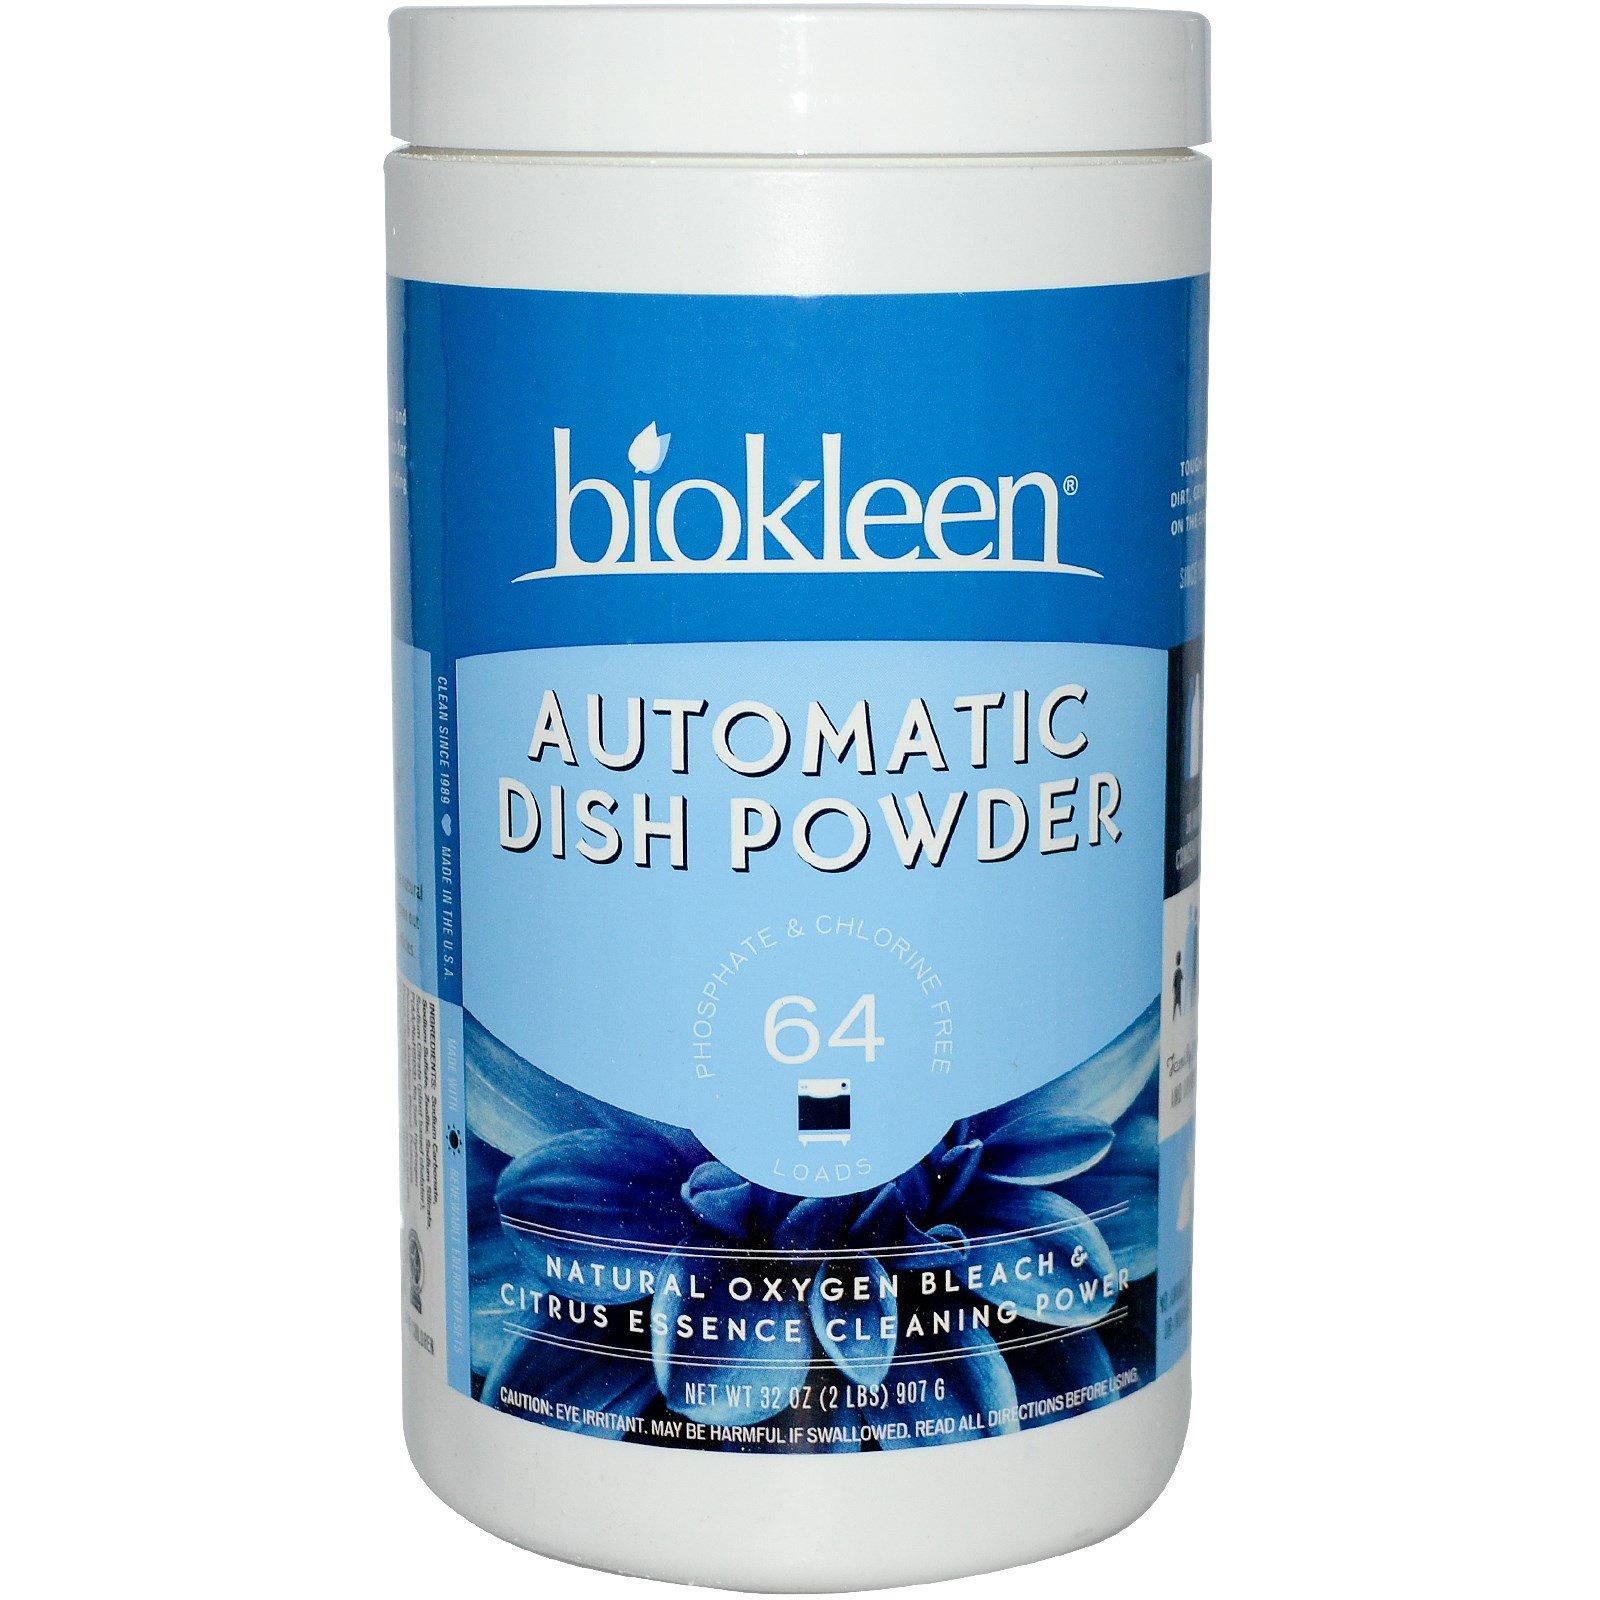 Bio Kleen, Automatic Dish Powder, 32 oz (907 g)